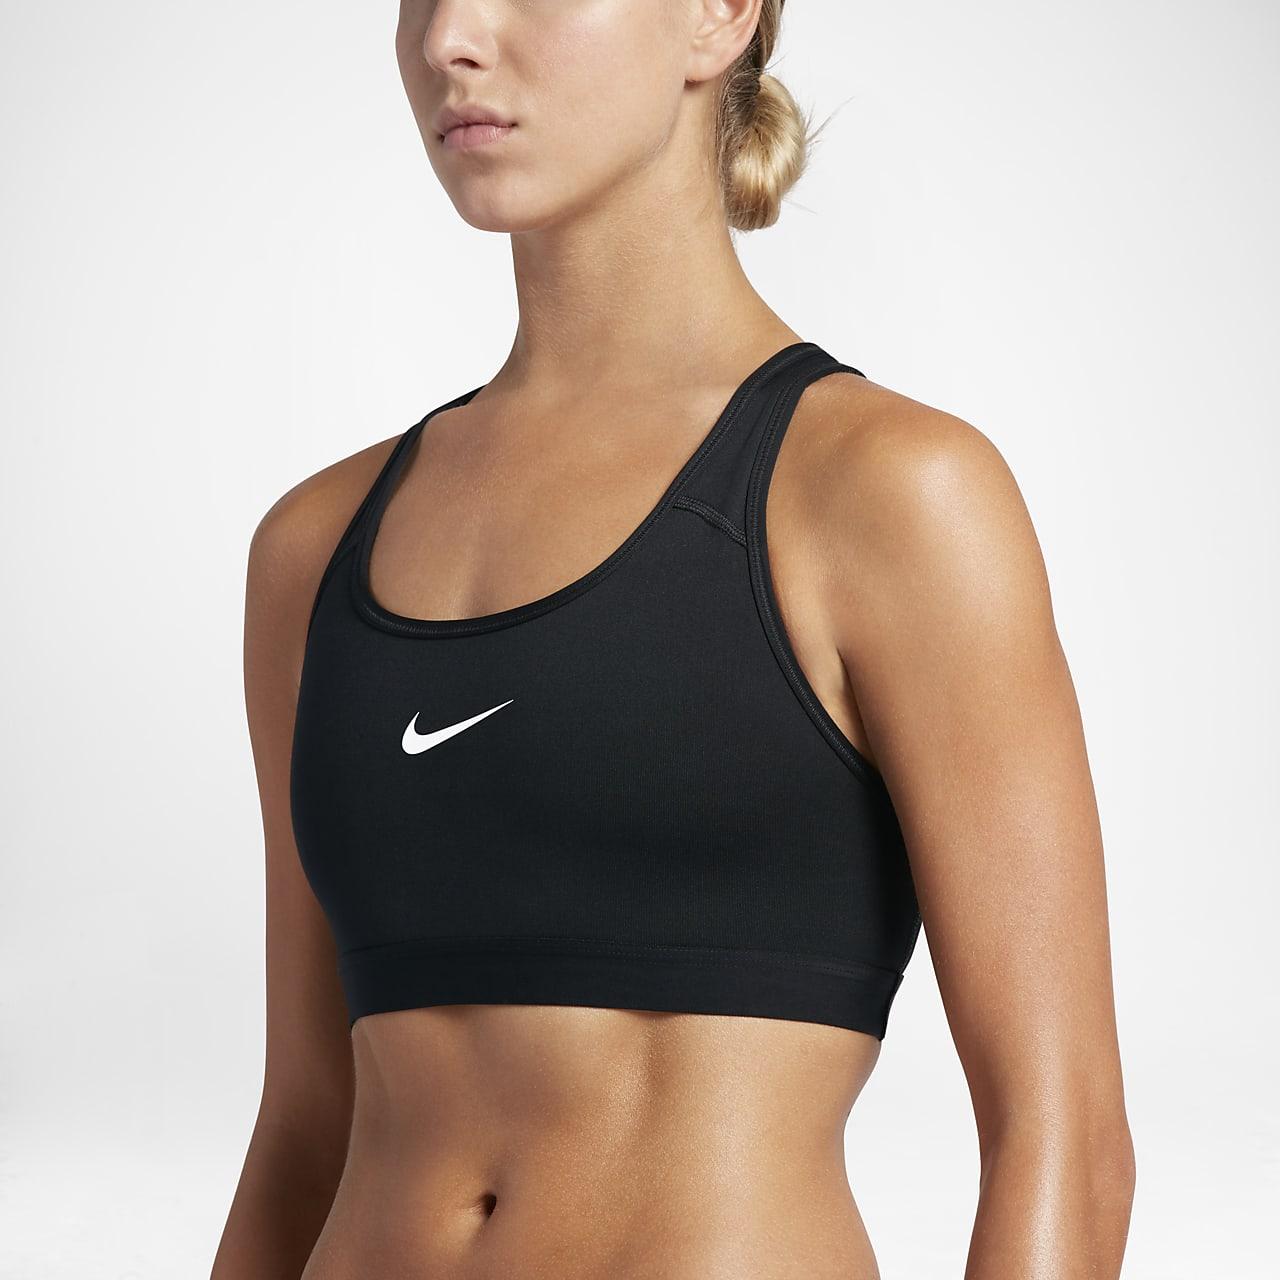 Nike Classic Women's Sports Bra